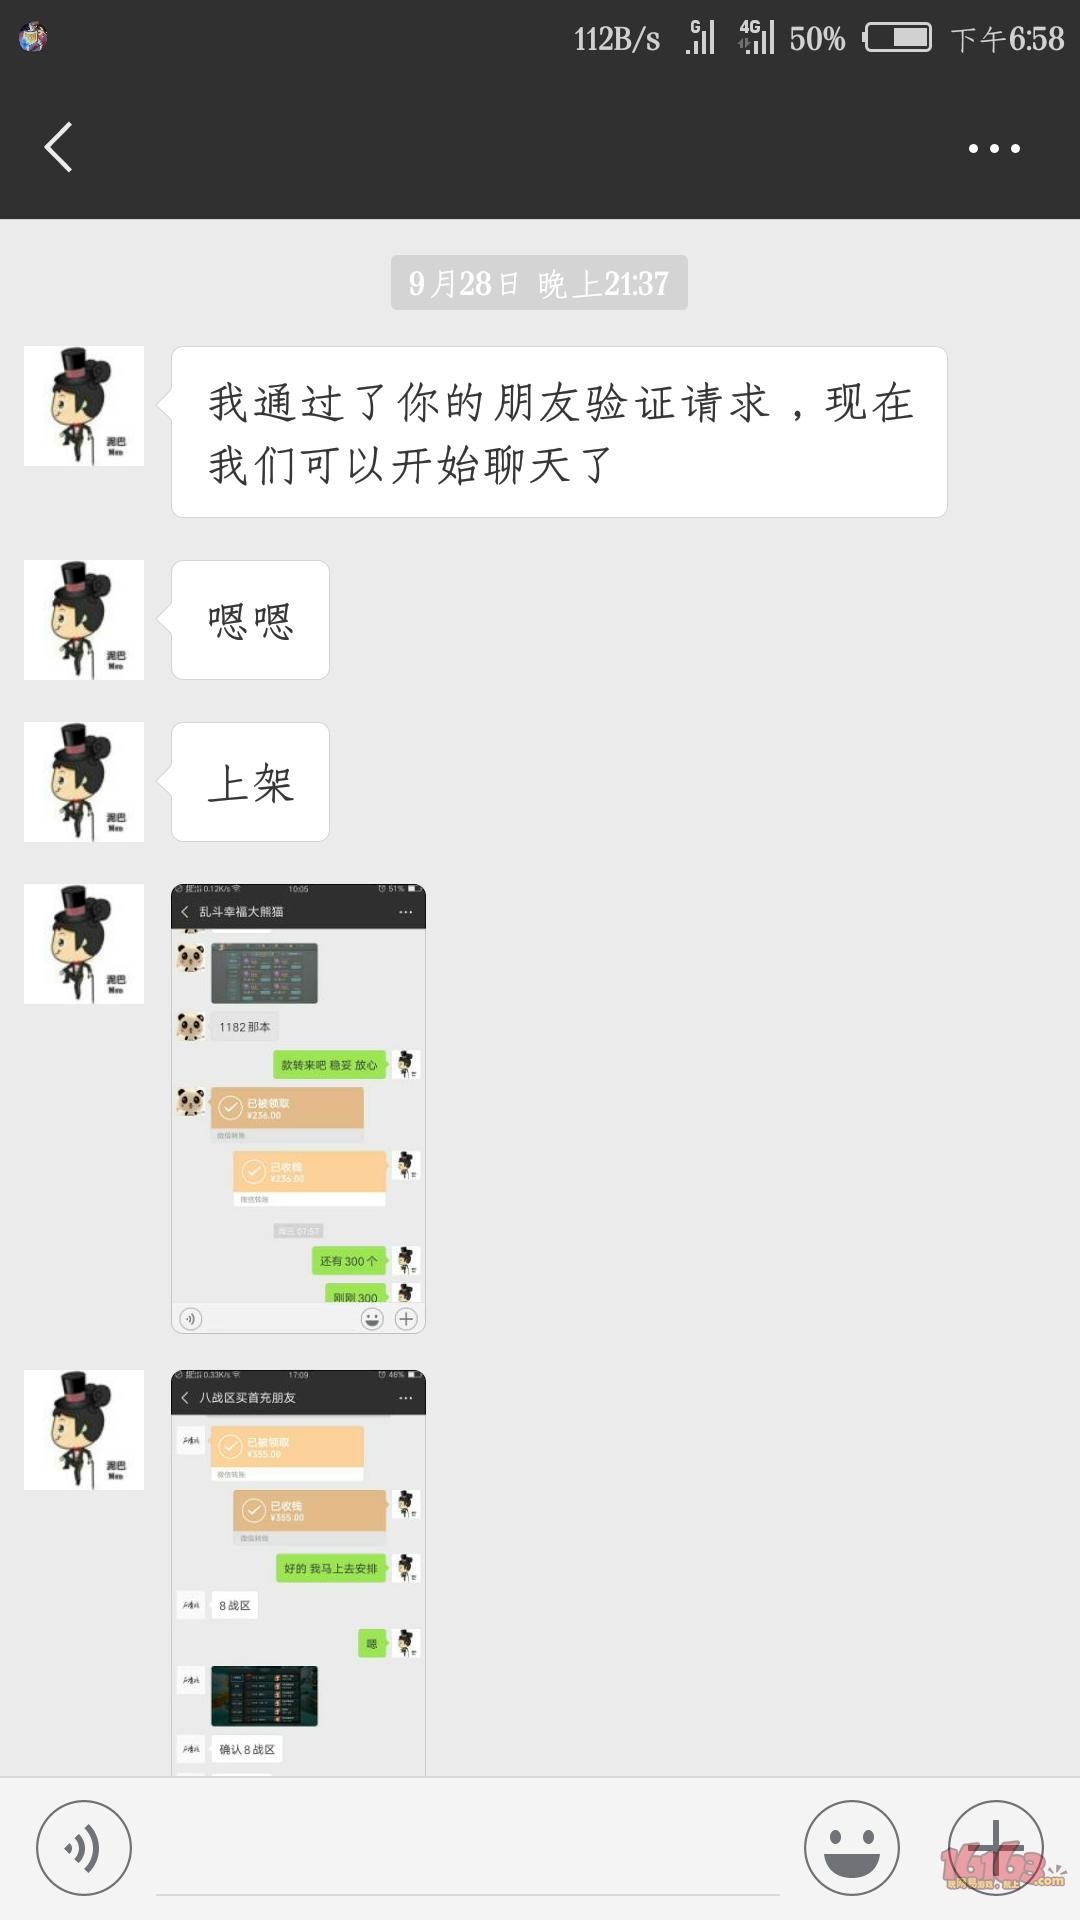 Screenshot_2018-10-08-18-58-32.png